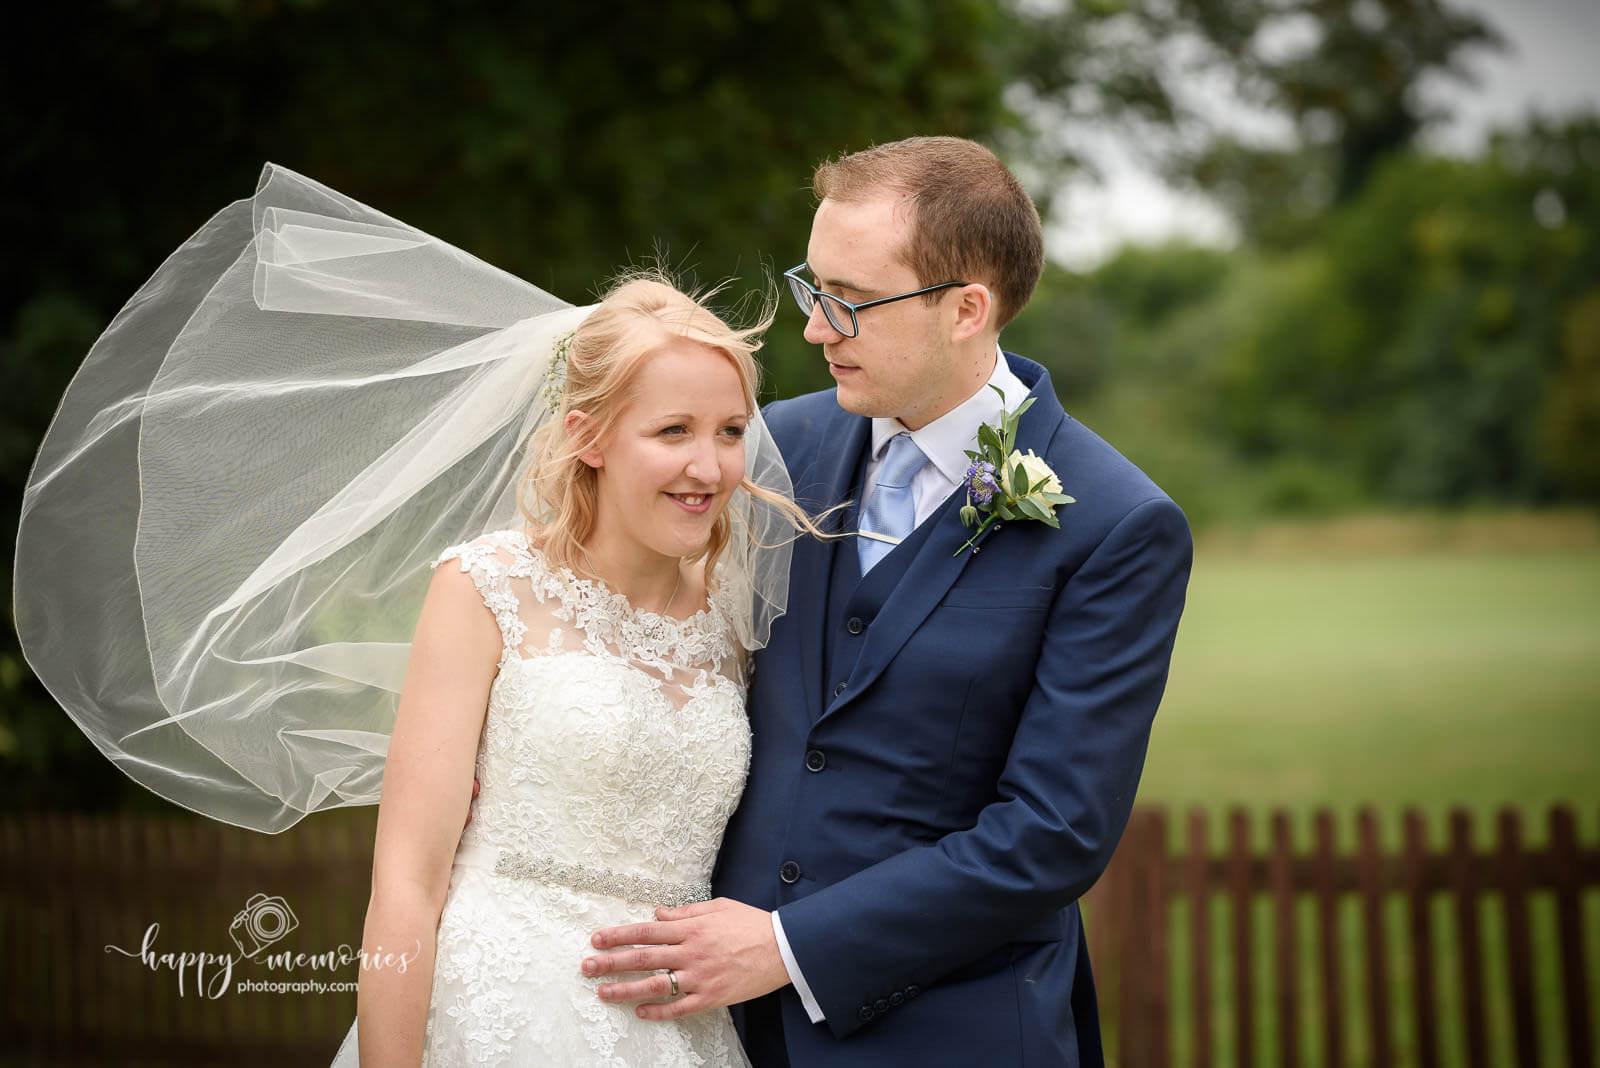 Wedding photographer East Grinstead-30